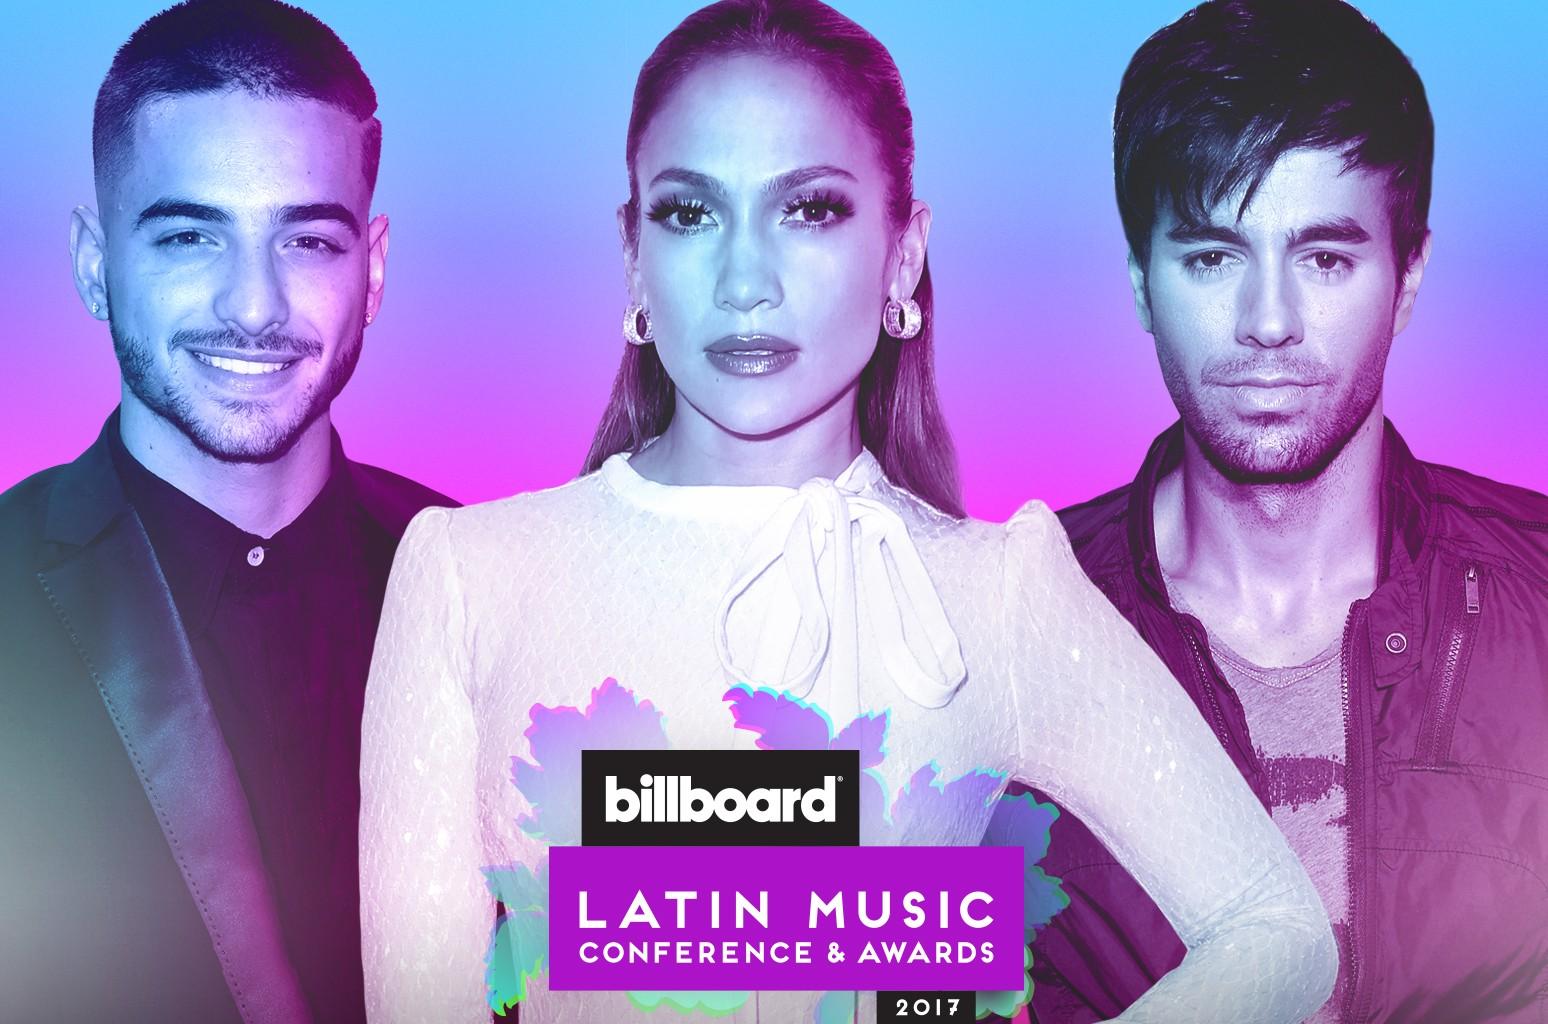 Maluma, Jennifer Lopez & Enrique Iglesias